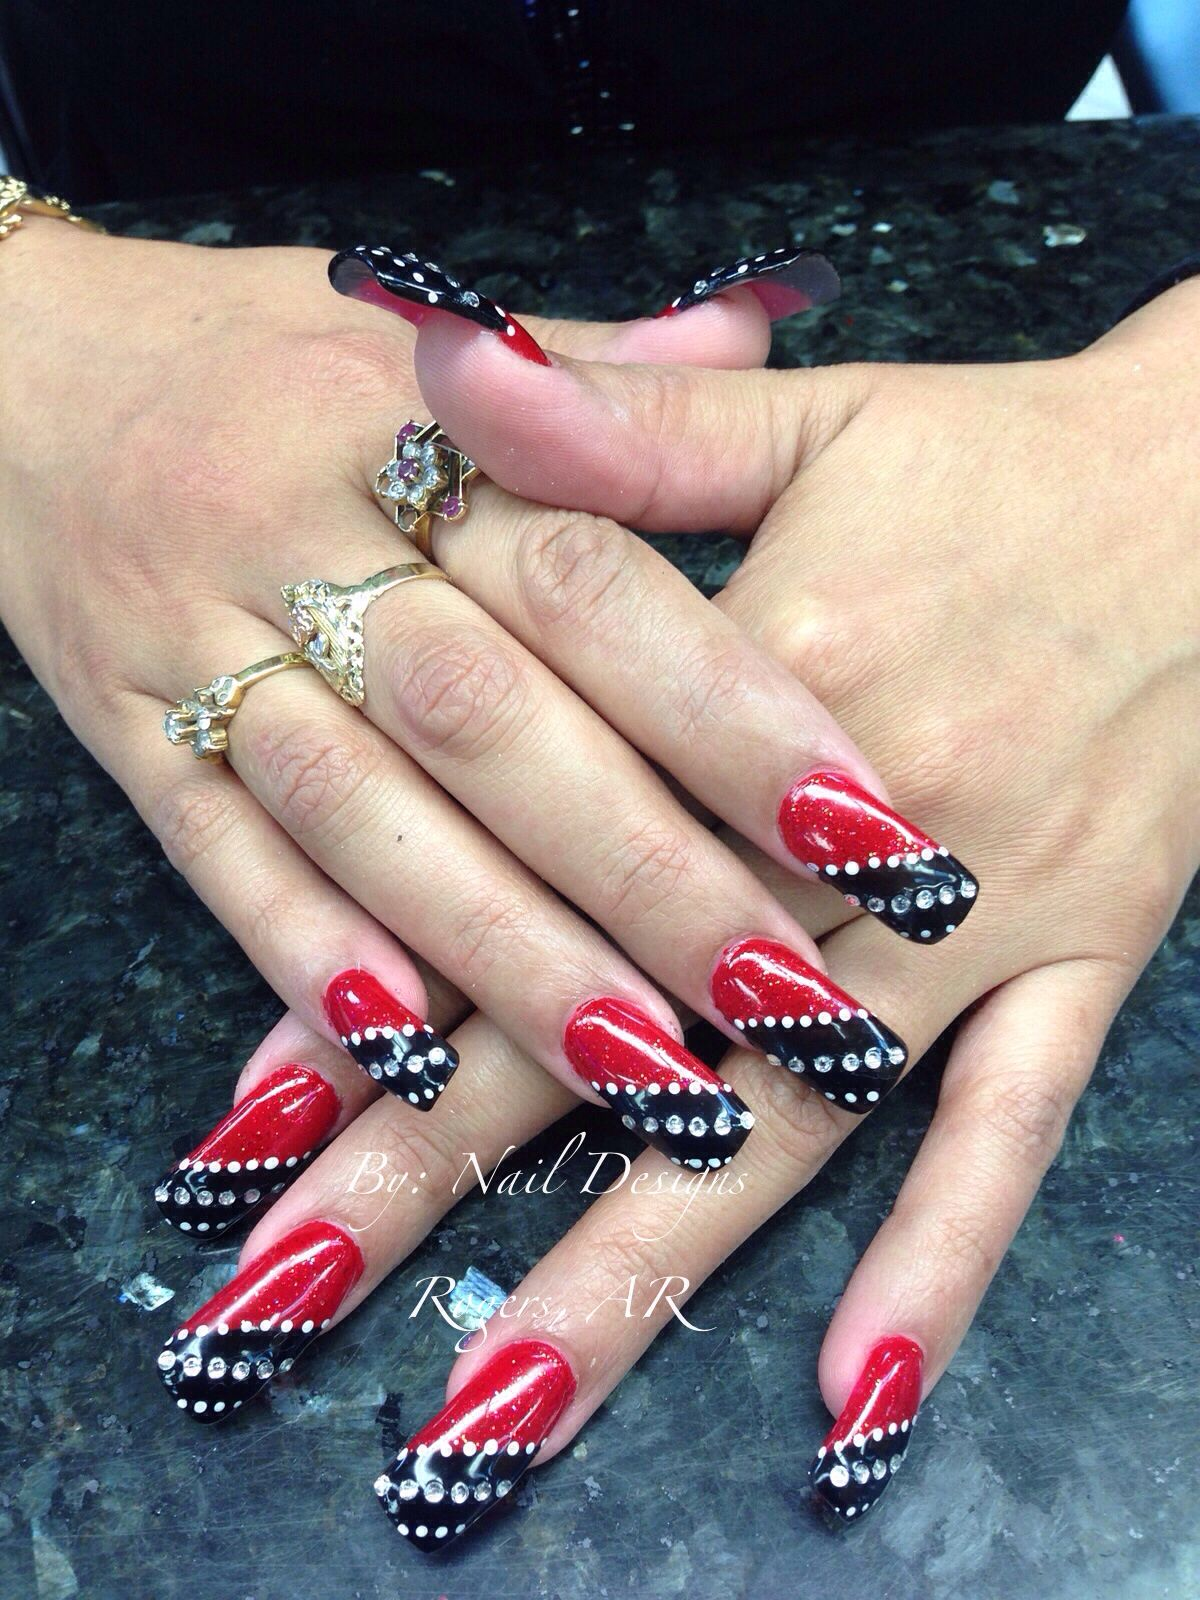 Nail Diamond Designs - Nails Gallery